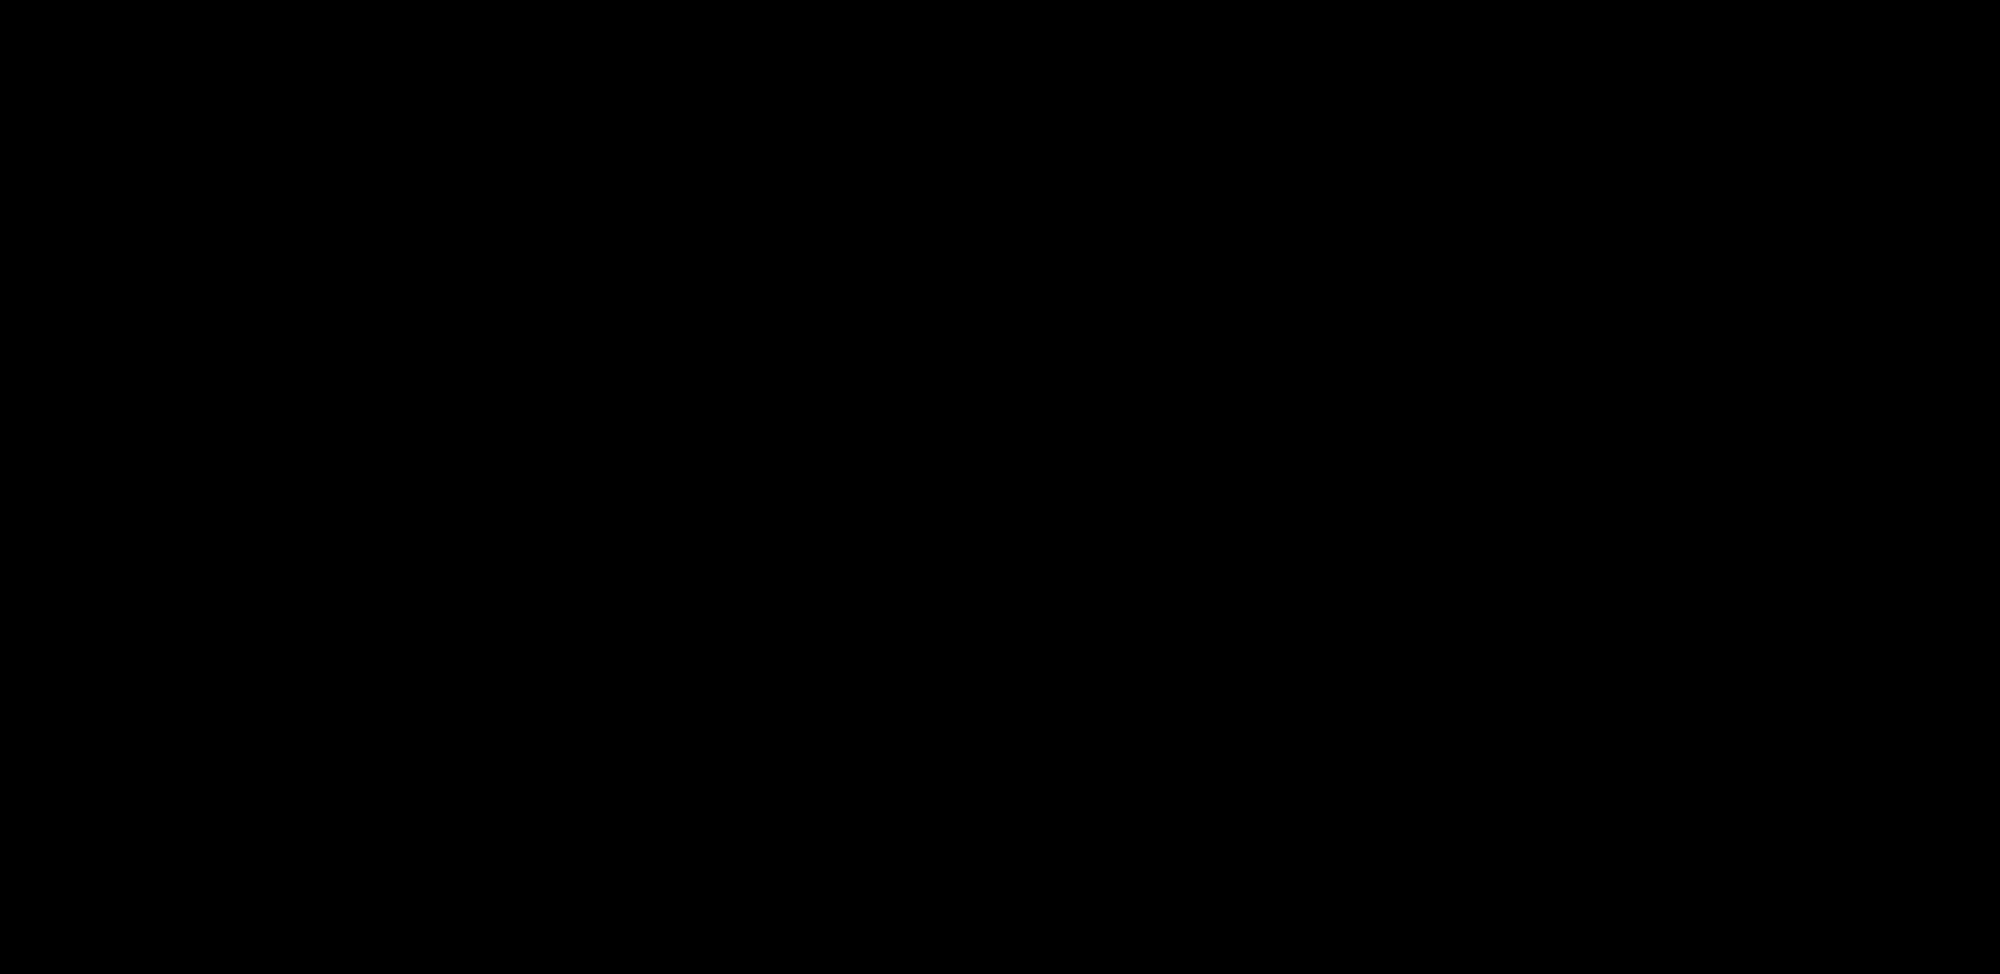 Flourish clipart signature. Free on dumielauxepices net